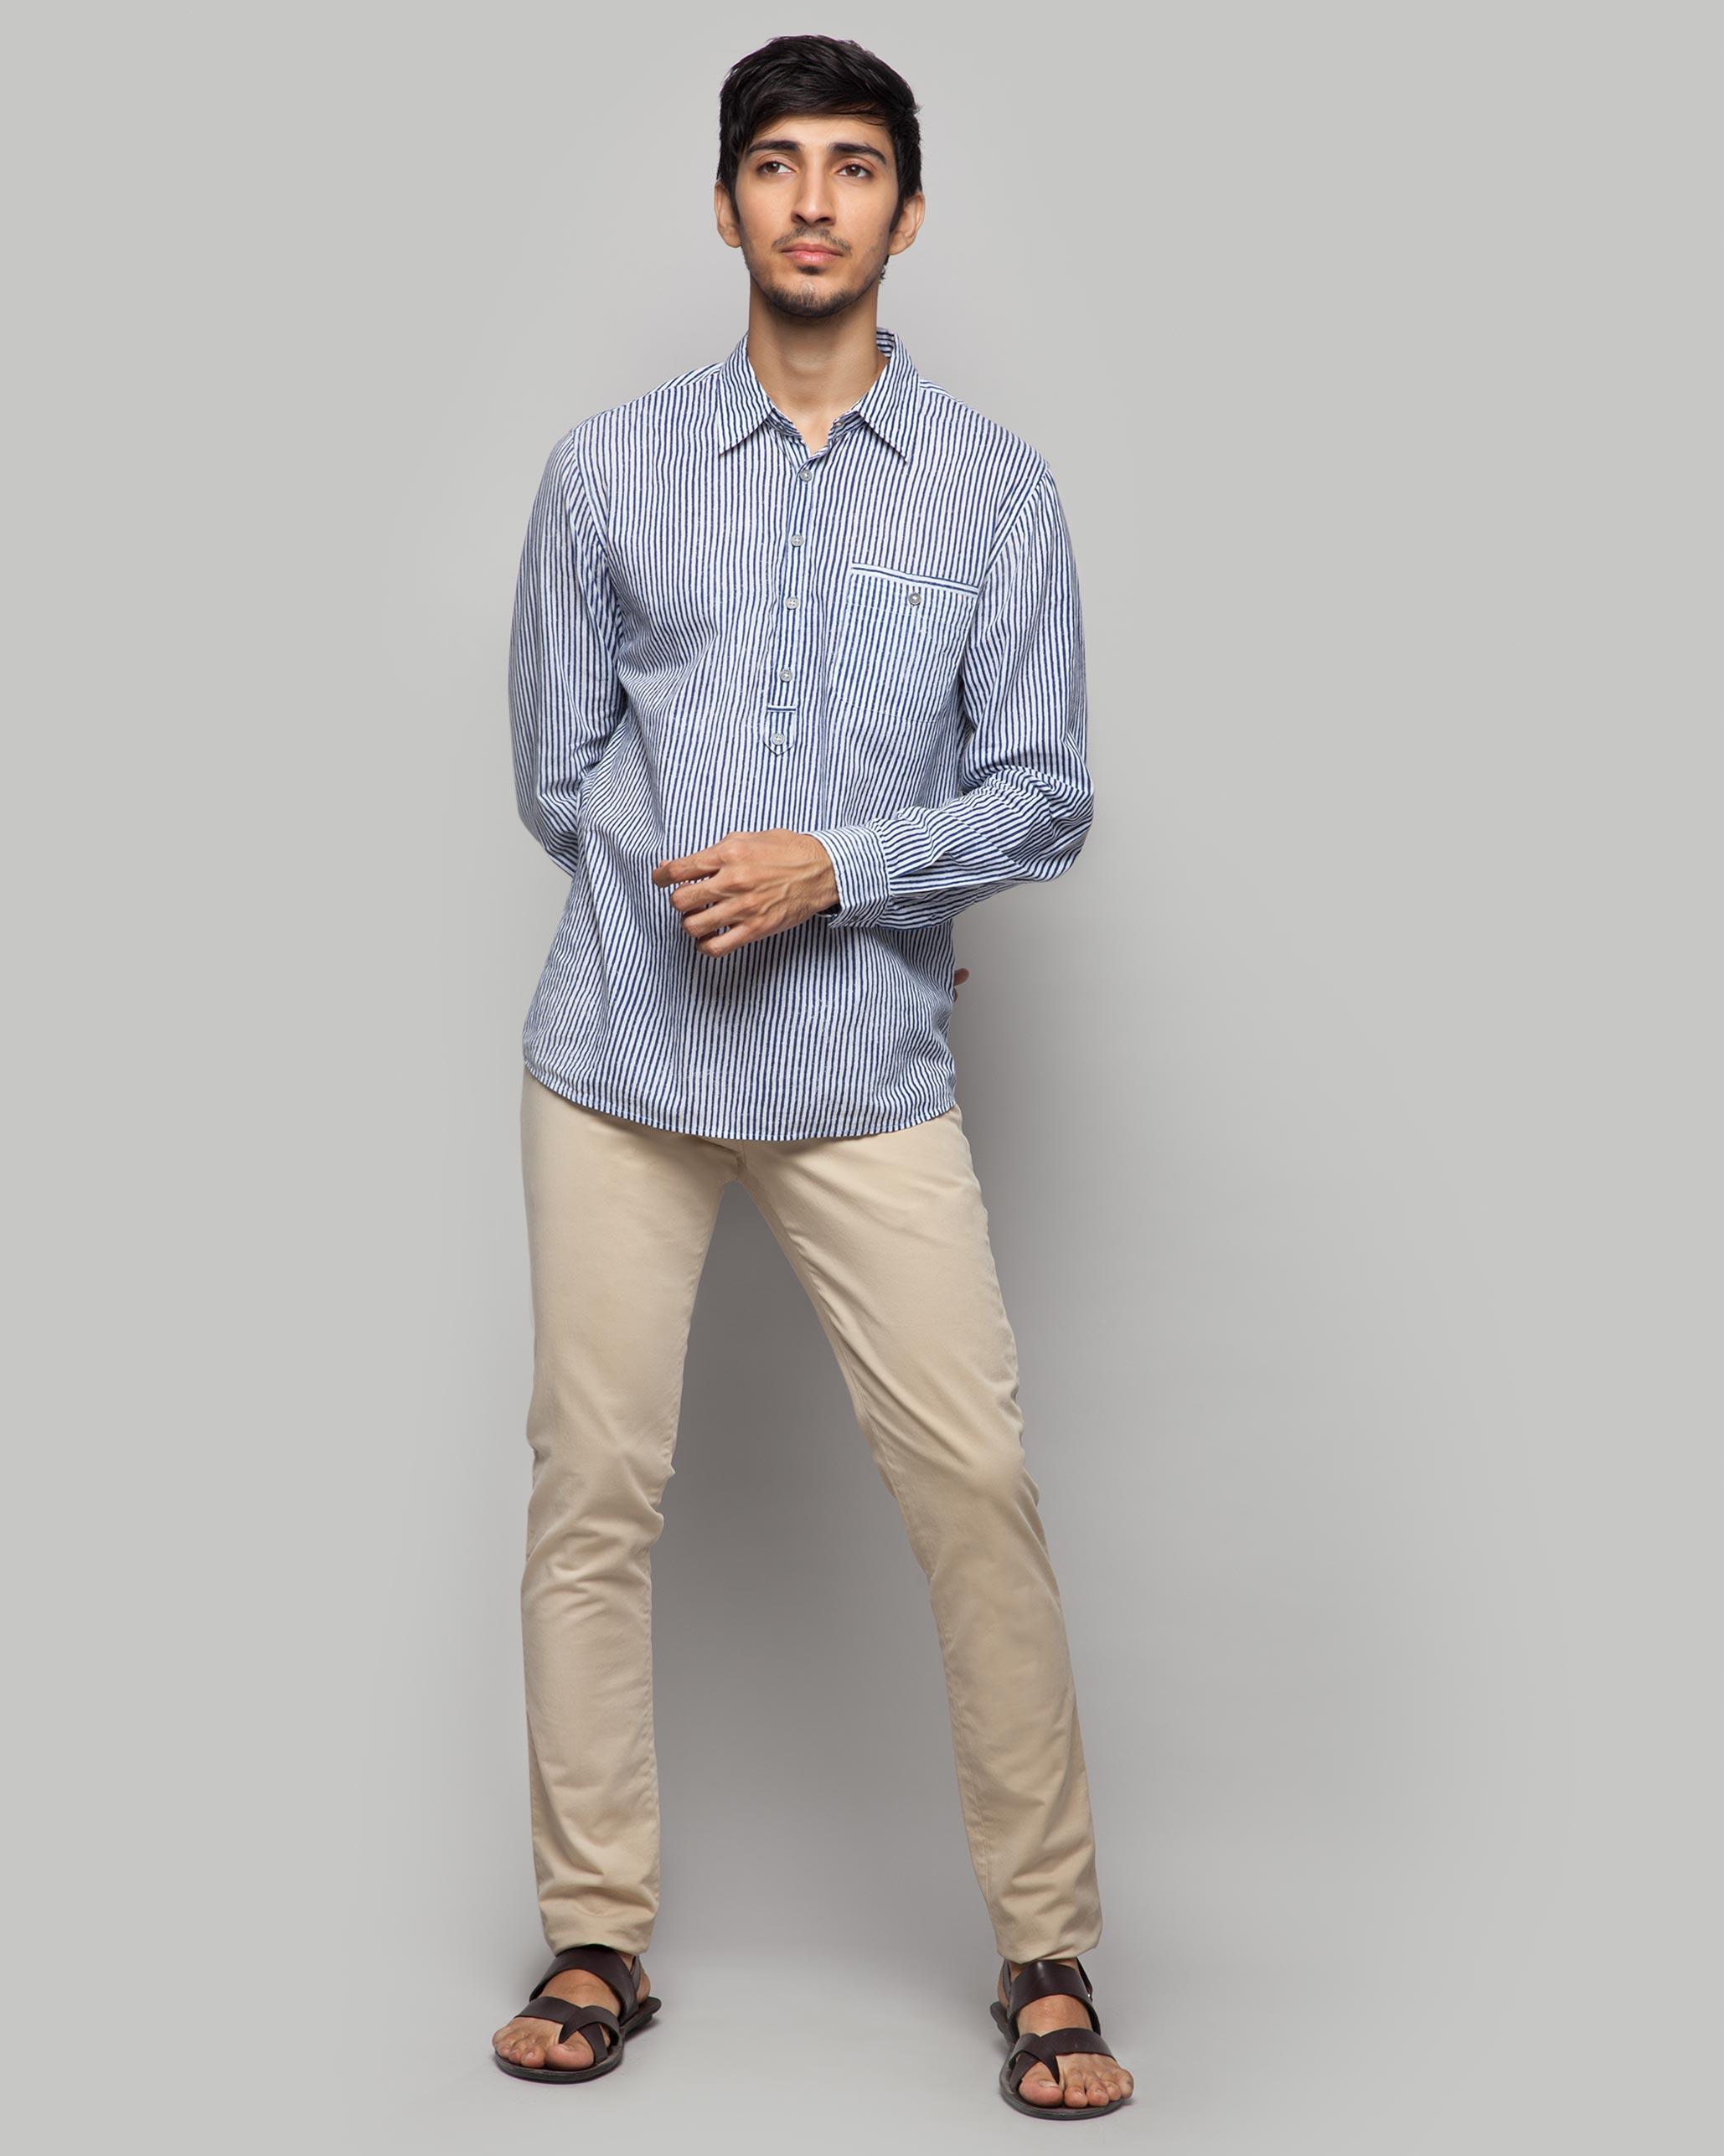 ae5f4e044f Buy Vagator Stripe Shirt - Blue & White: T-Shirts & Shirts for Men Online |  Nicobar